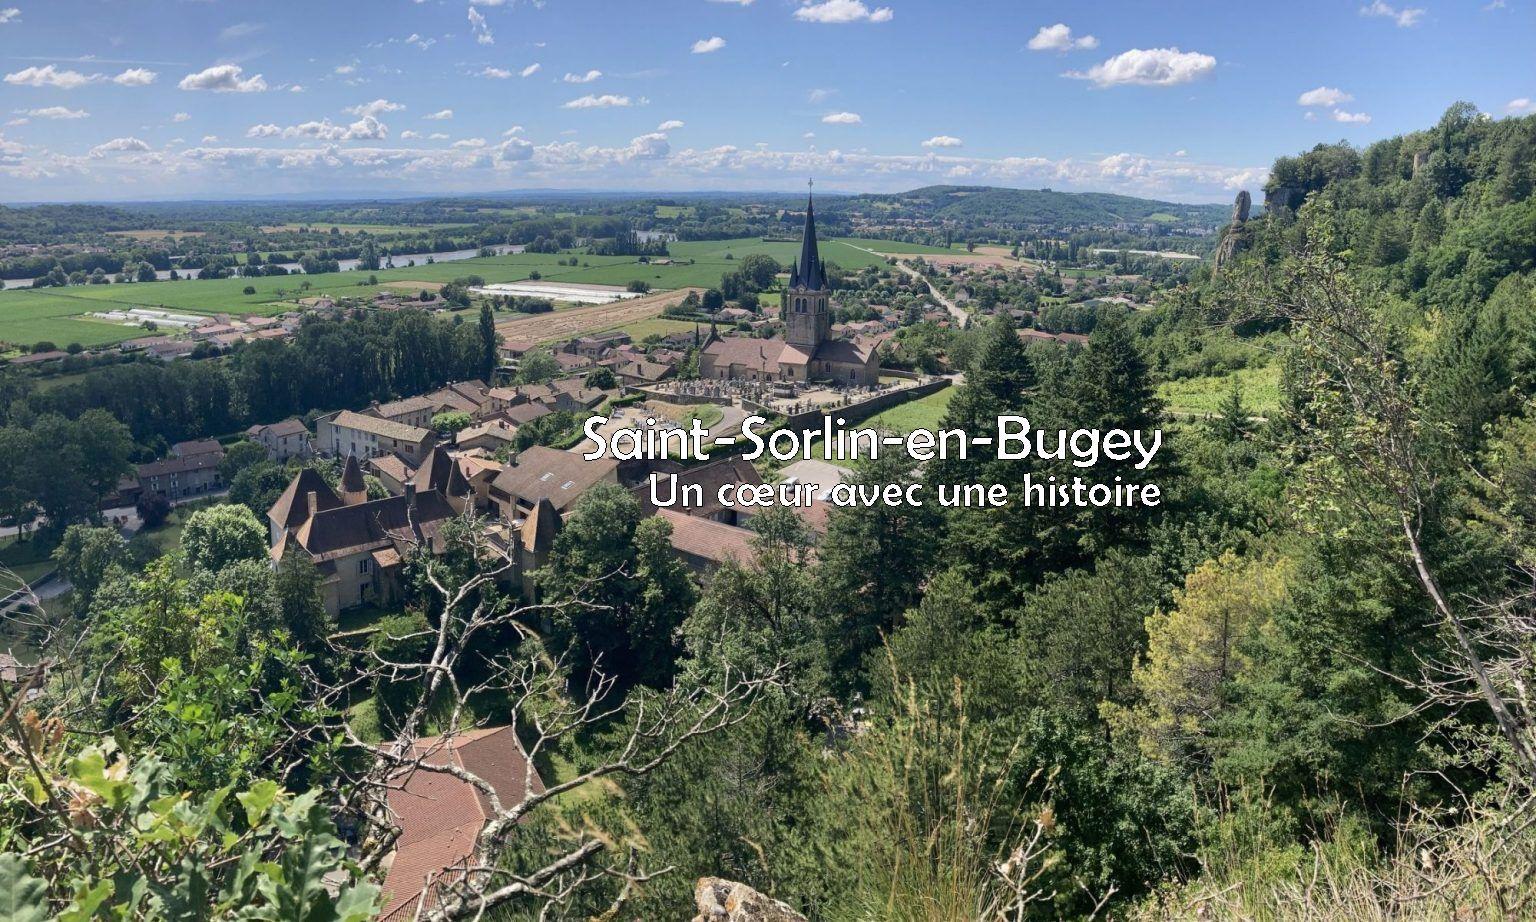 Saint-Sorlin-en-Bugey